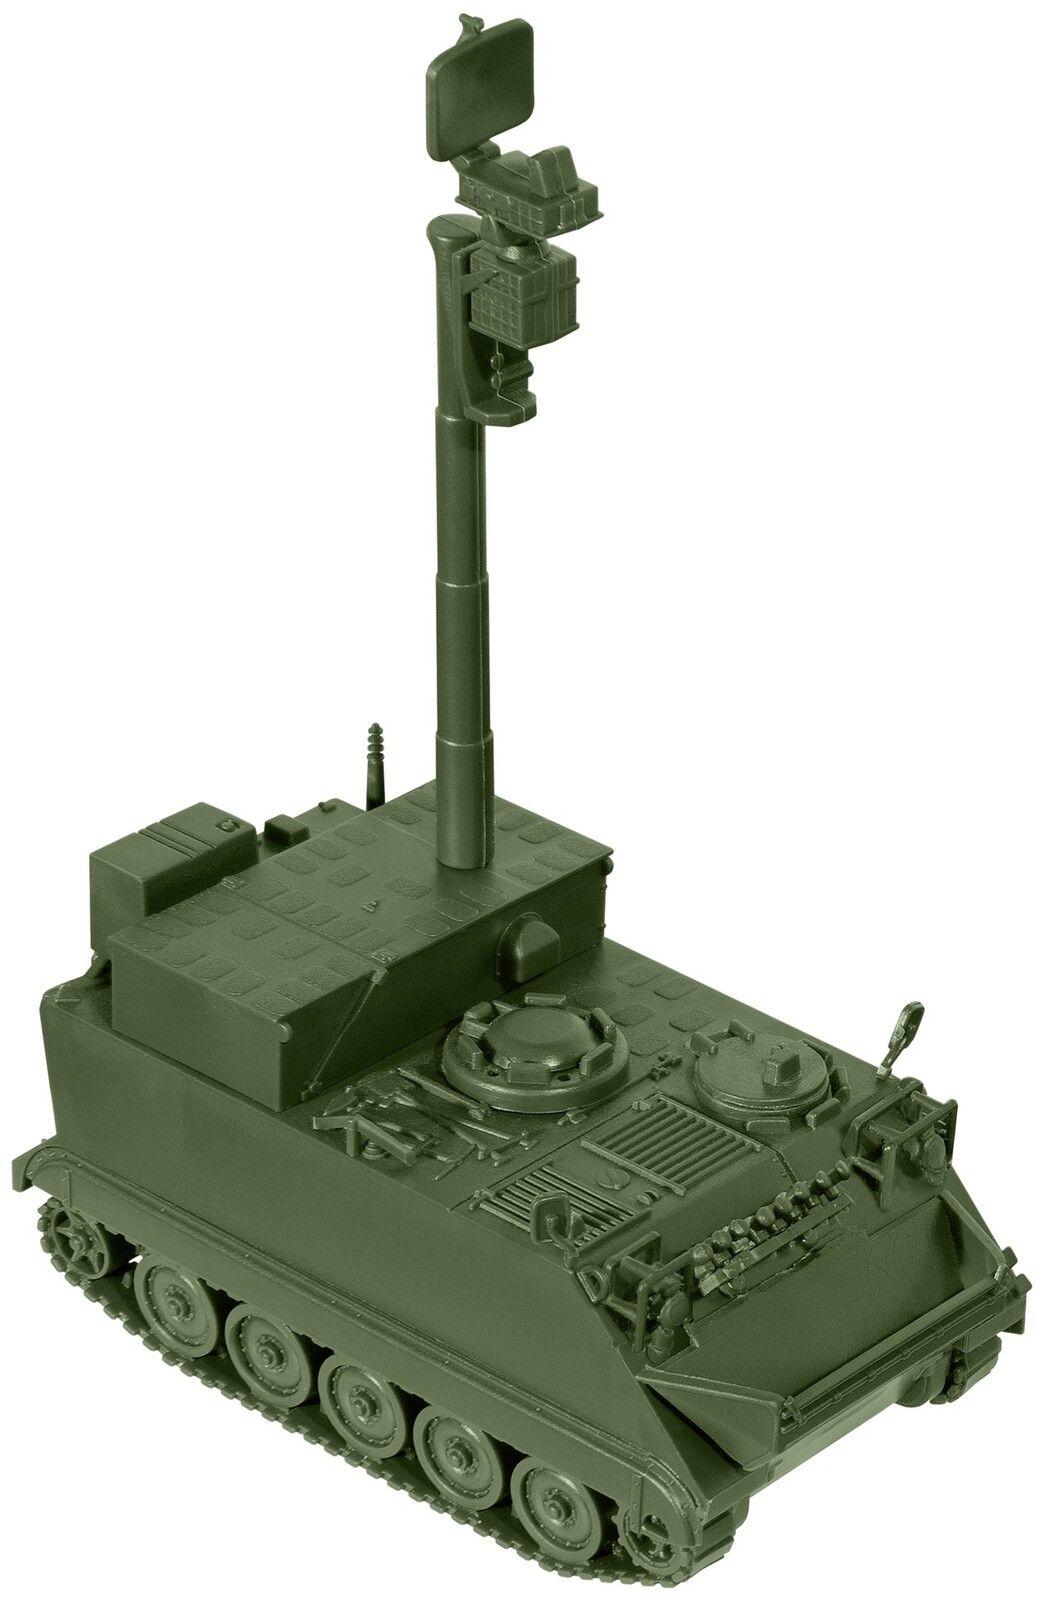 Roco H0 05075 Minitank Bausatz  M 113 Trägerfahrzeug RATAC  BW 1 87 NEU + OVP